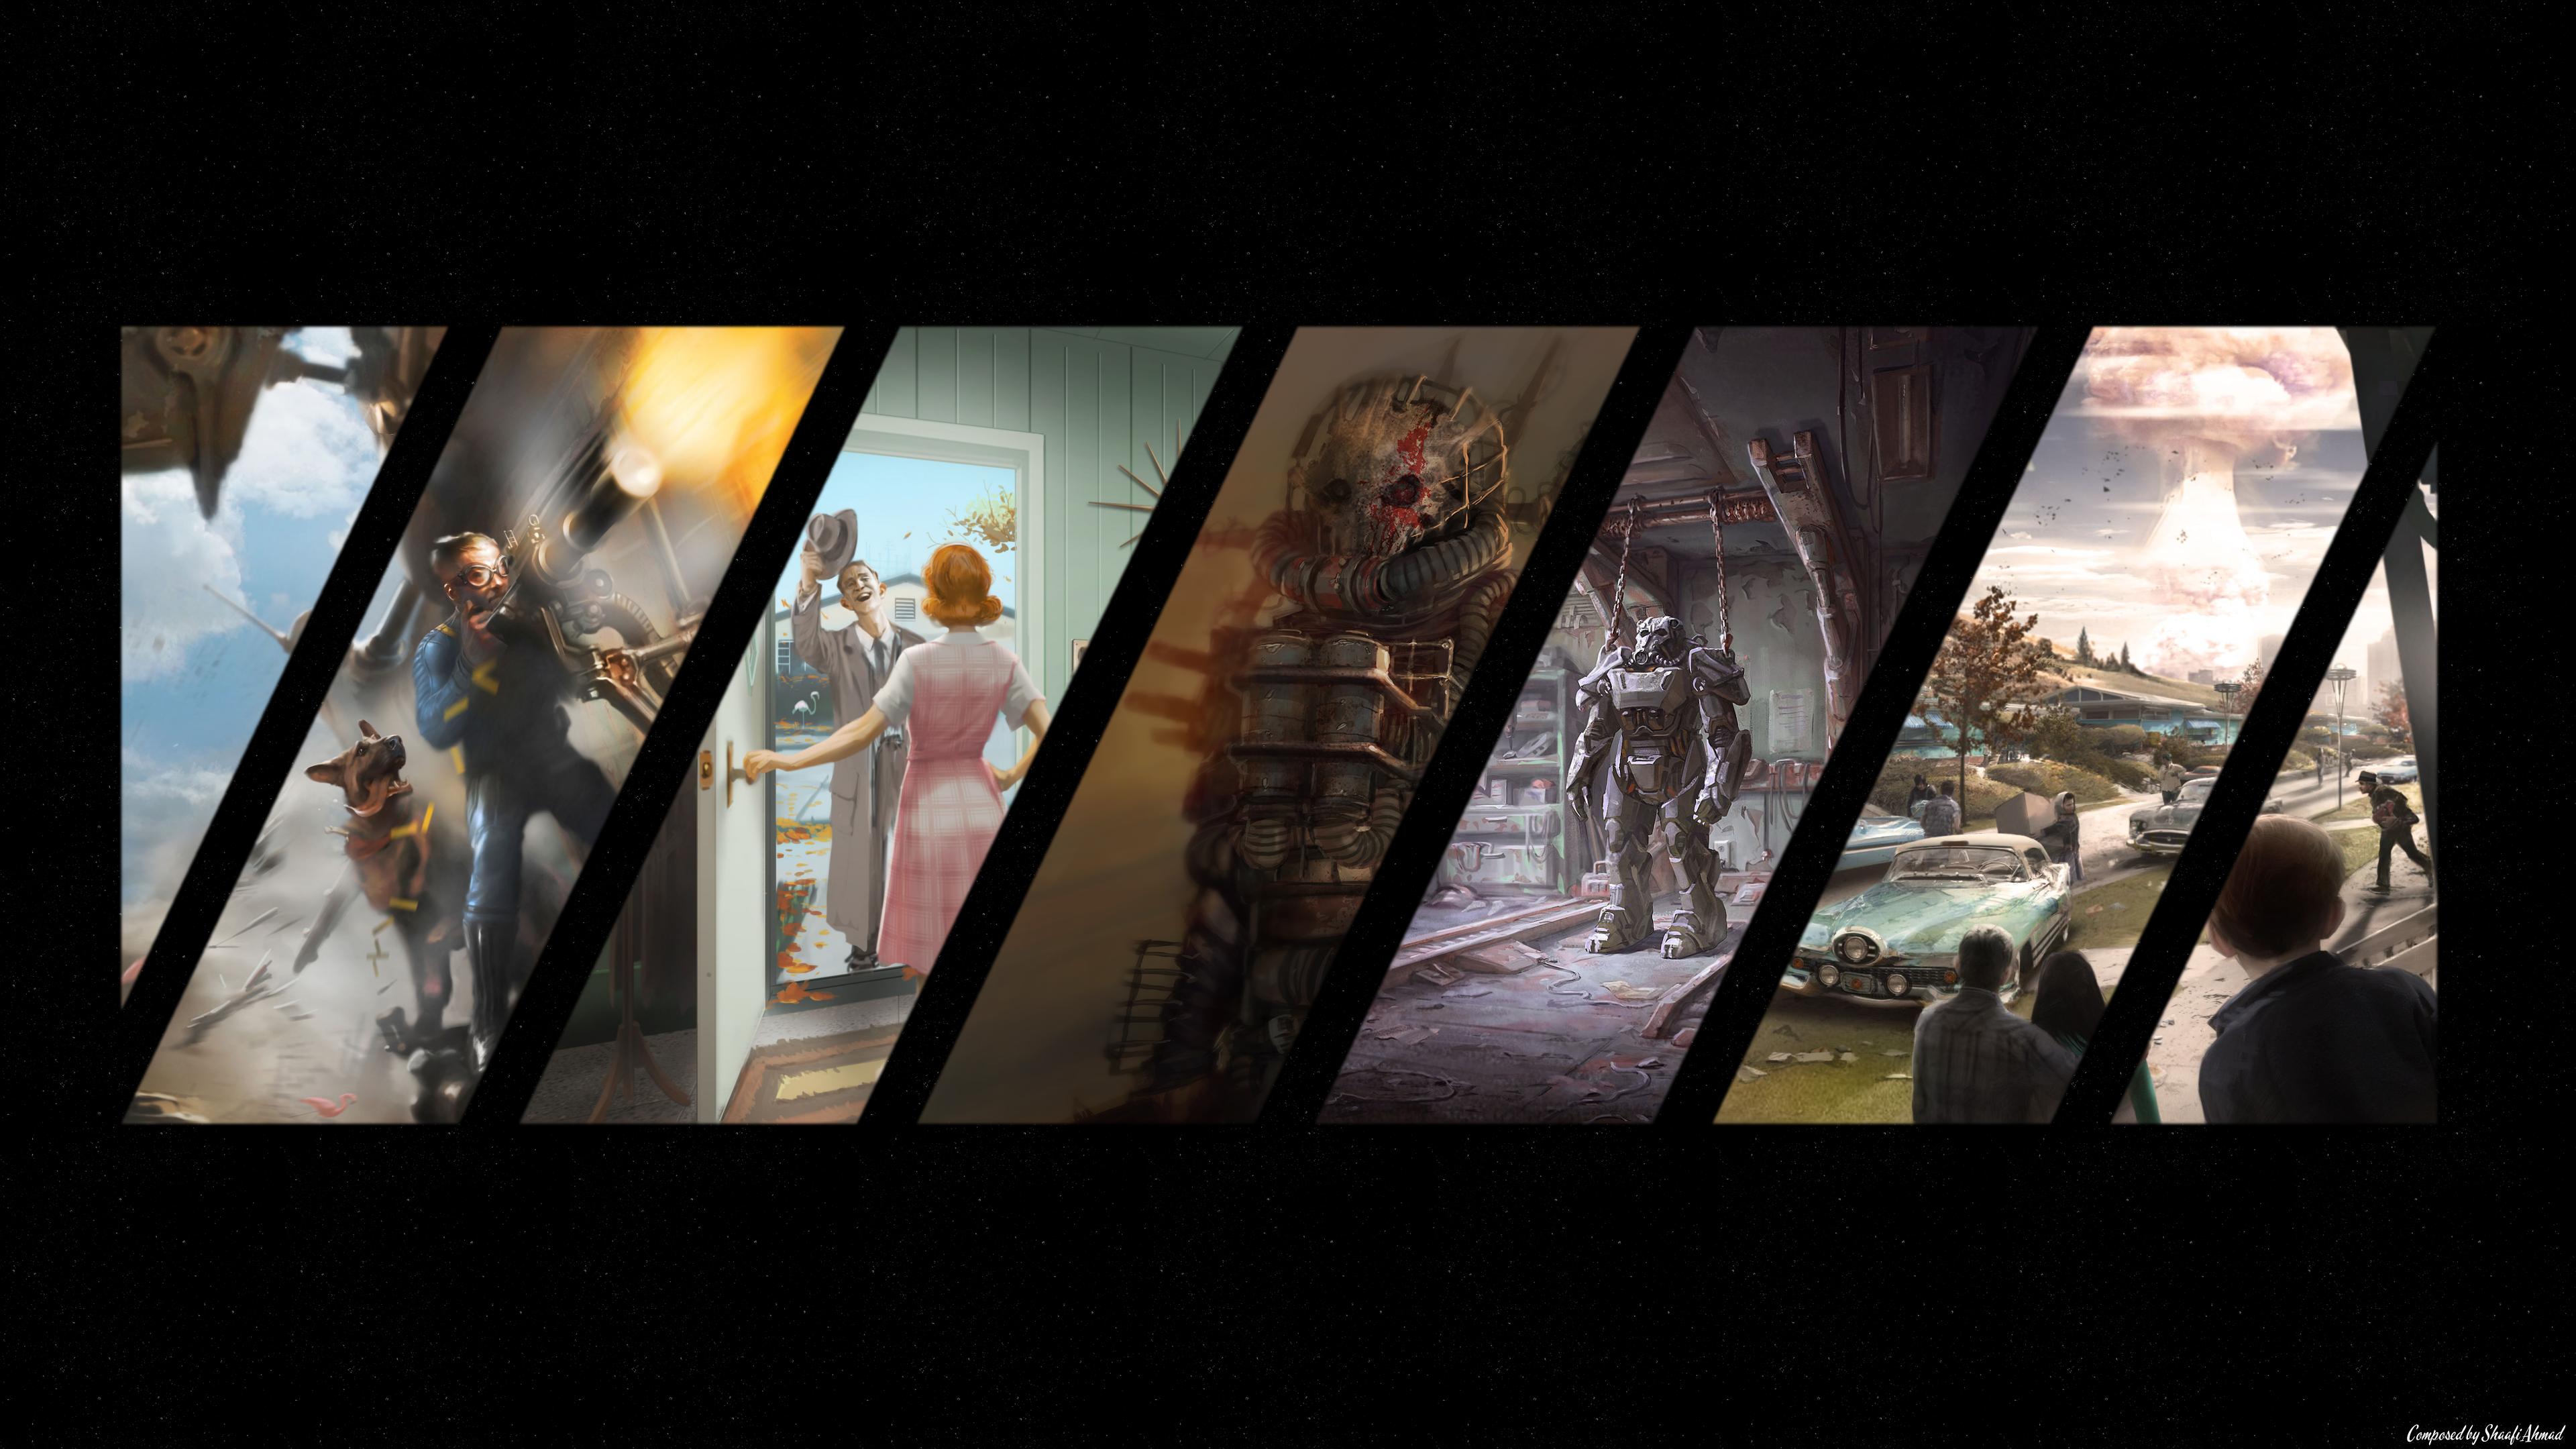 Fallout 4 HD Wallpaper - Fallout 4 HD PNG